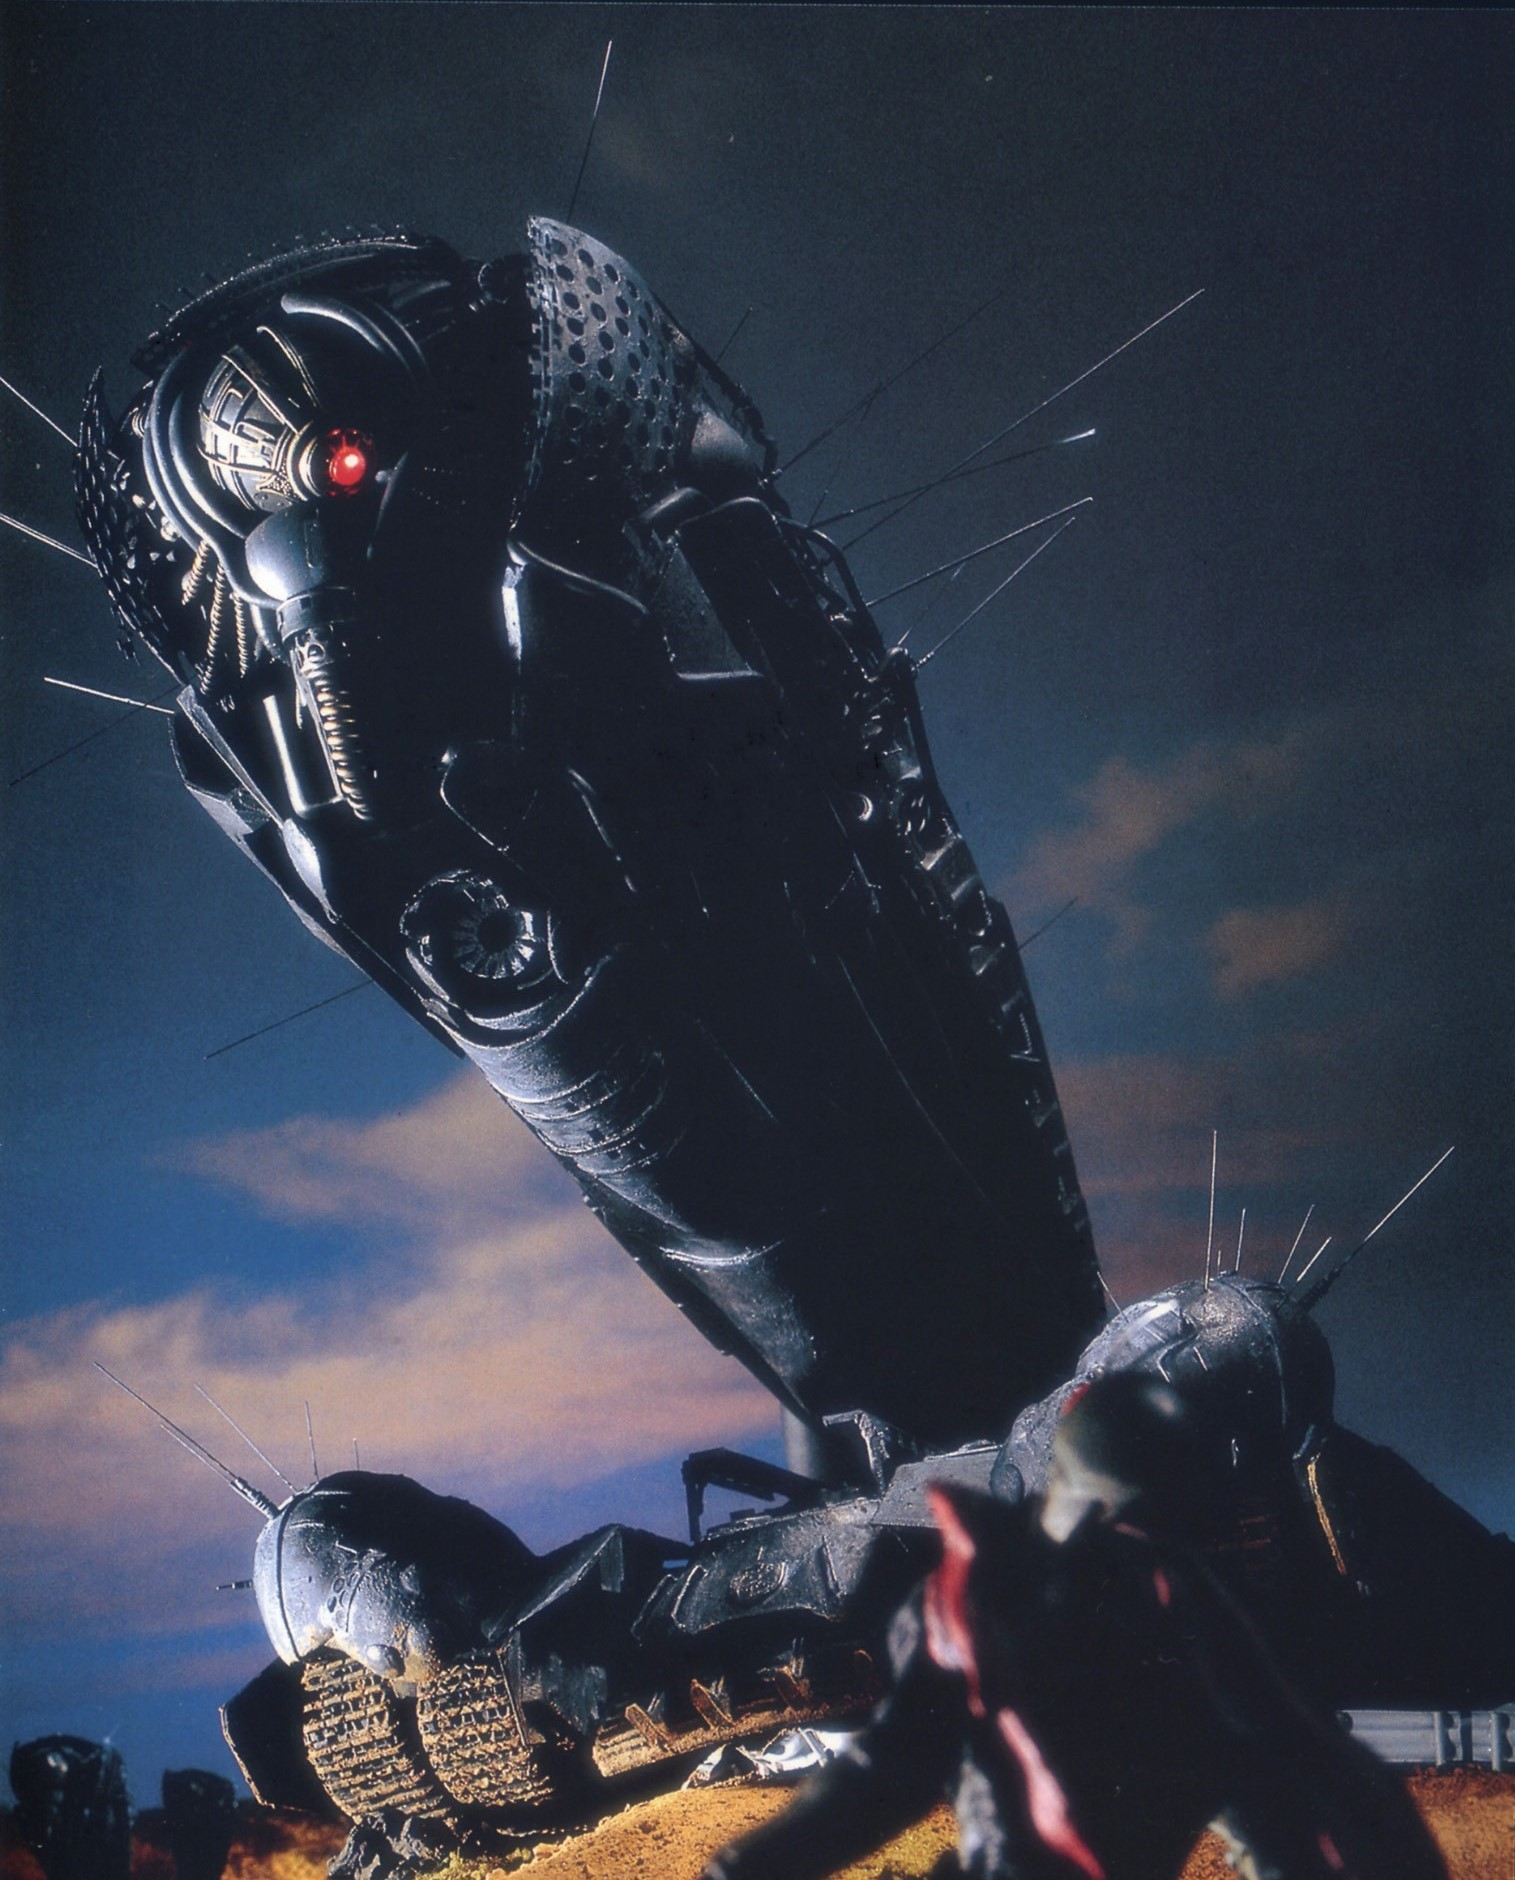 Shocker Kamen Rider Wiki FANDOM powered by Wikia 7751622